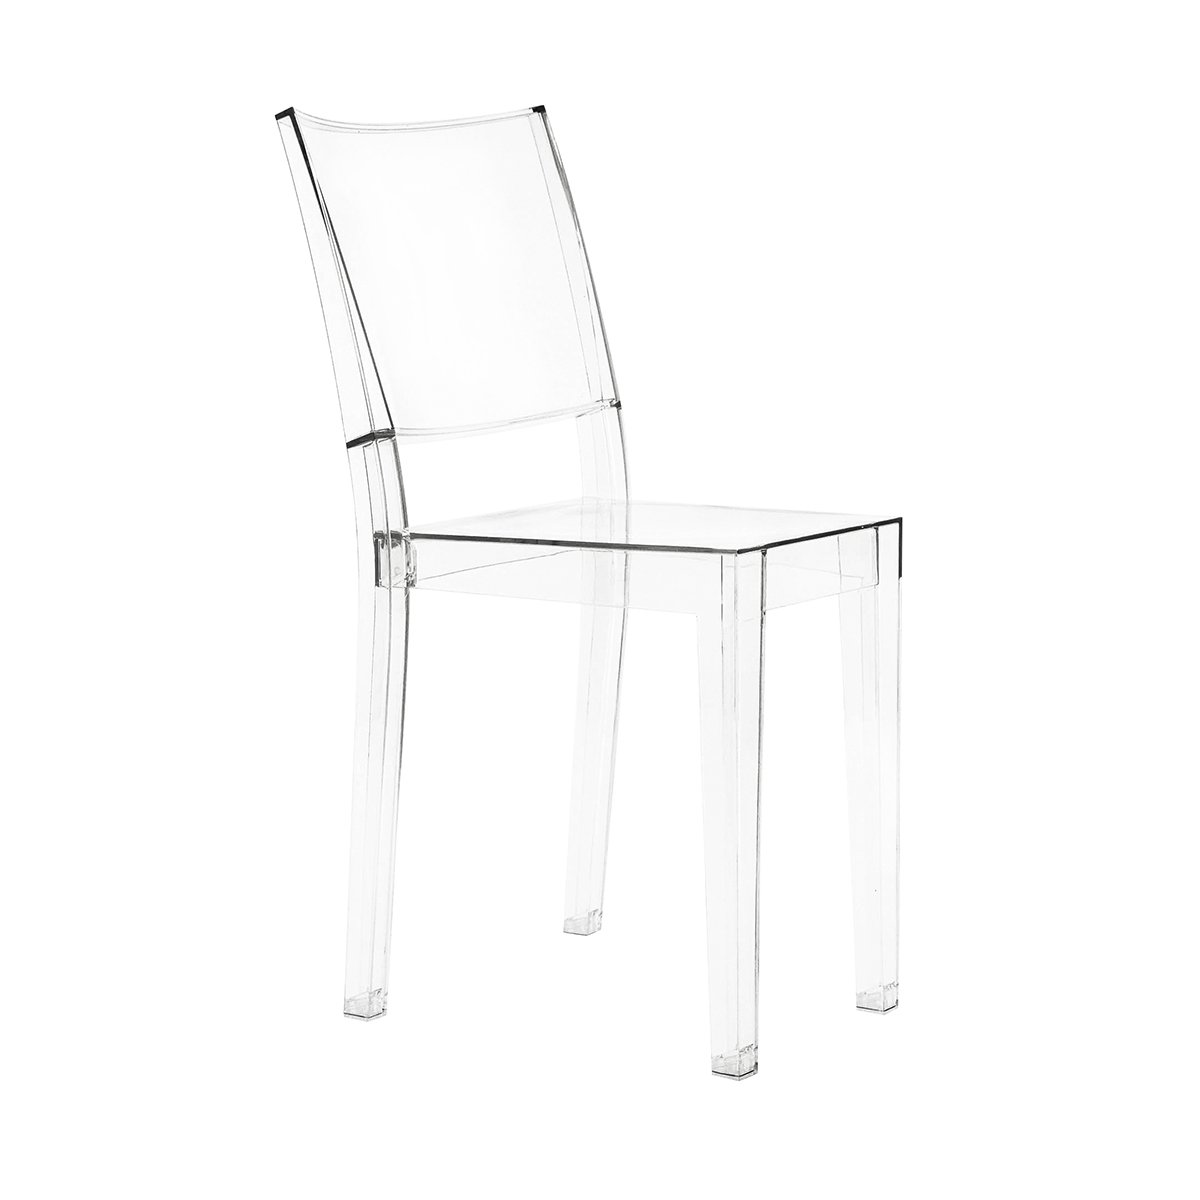 Kartell La Marie Chair - Transparent: Amazon.co.uk: Kitchen & Home